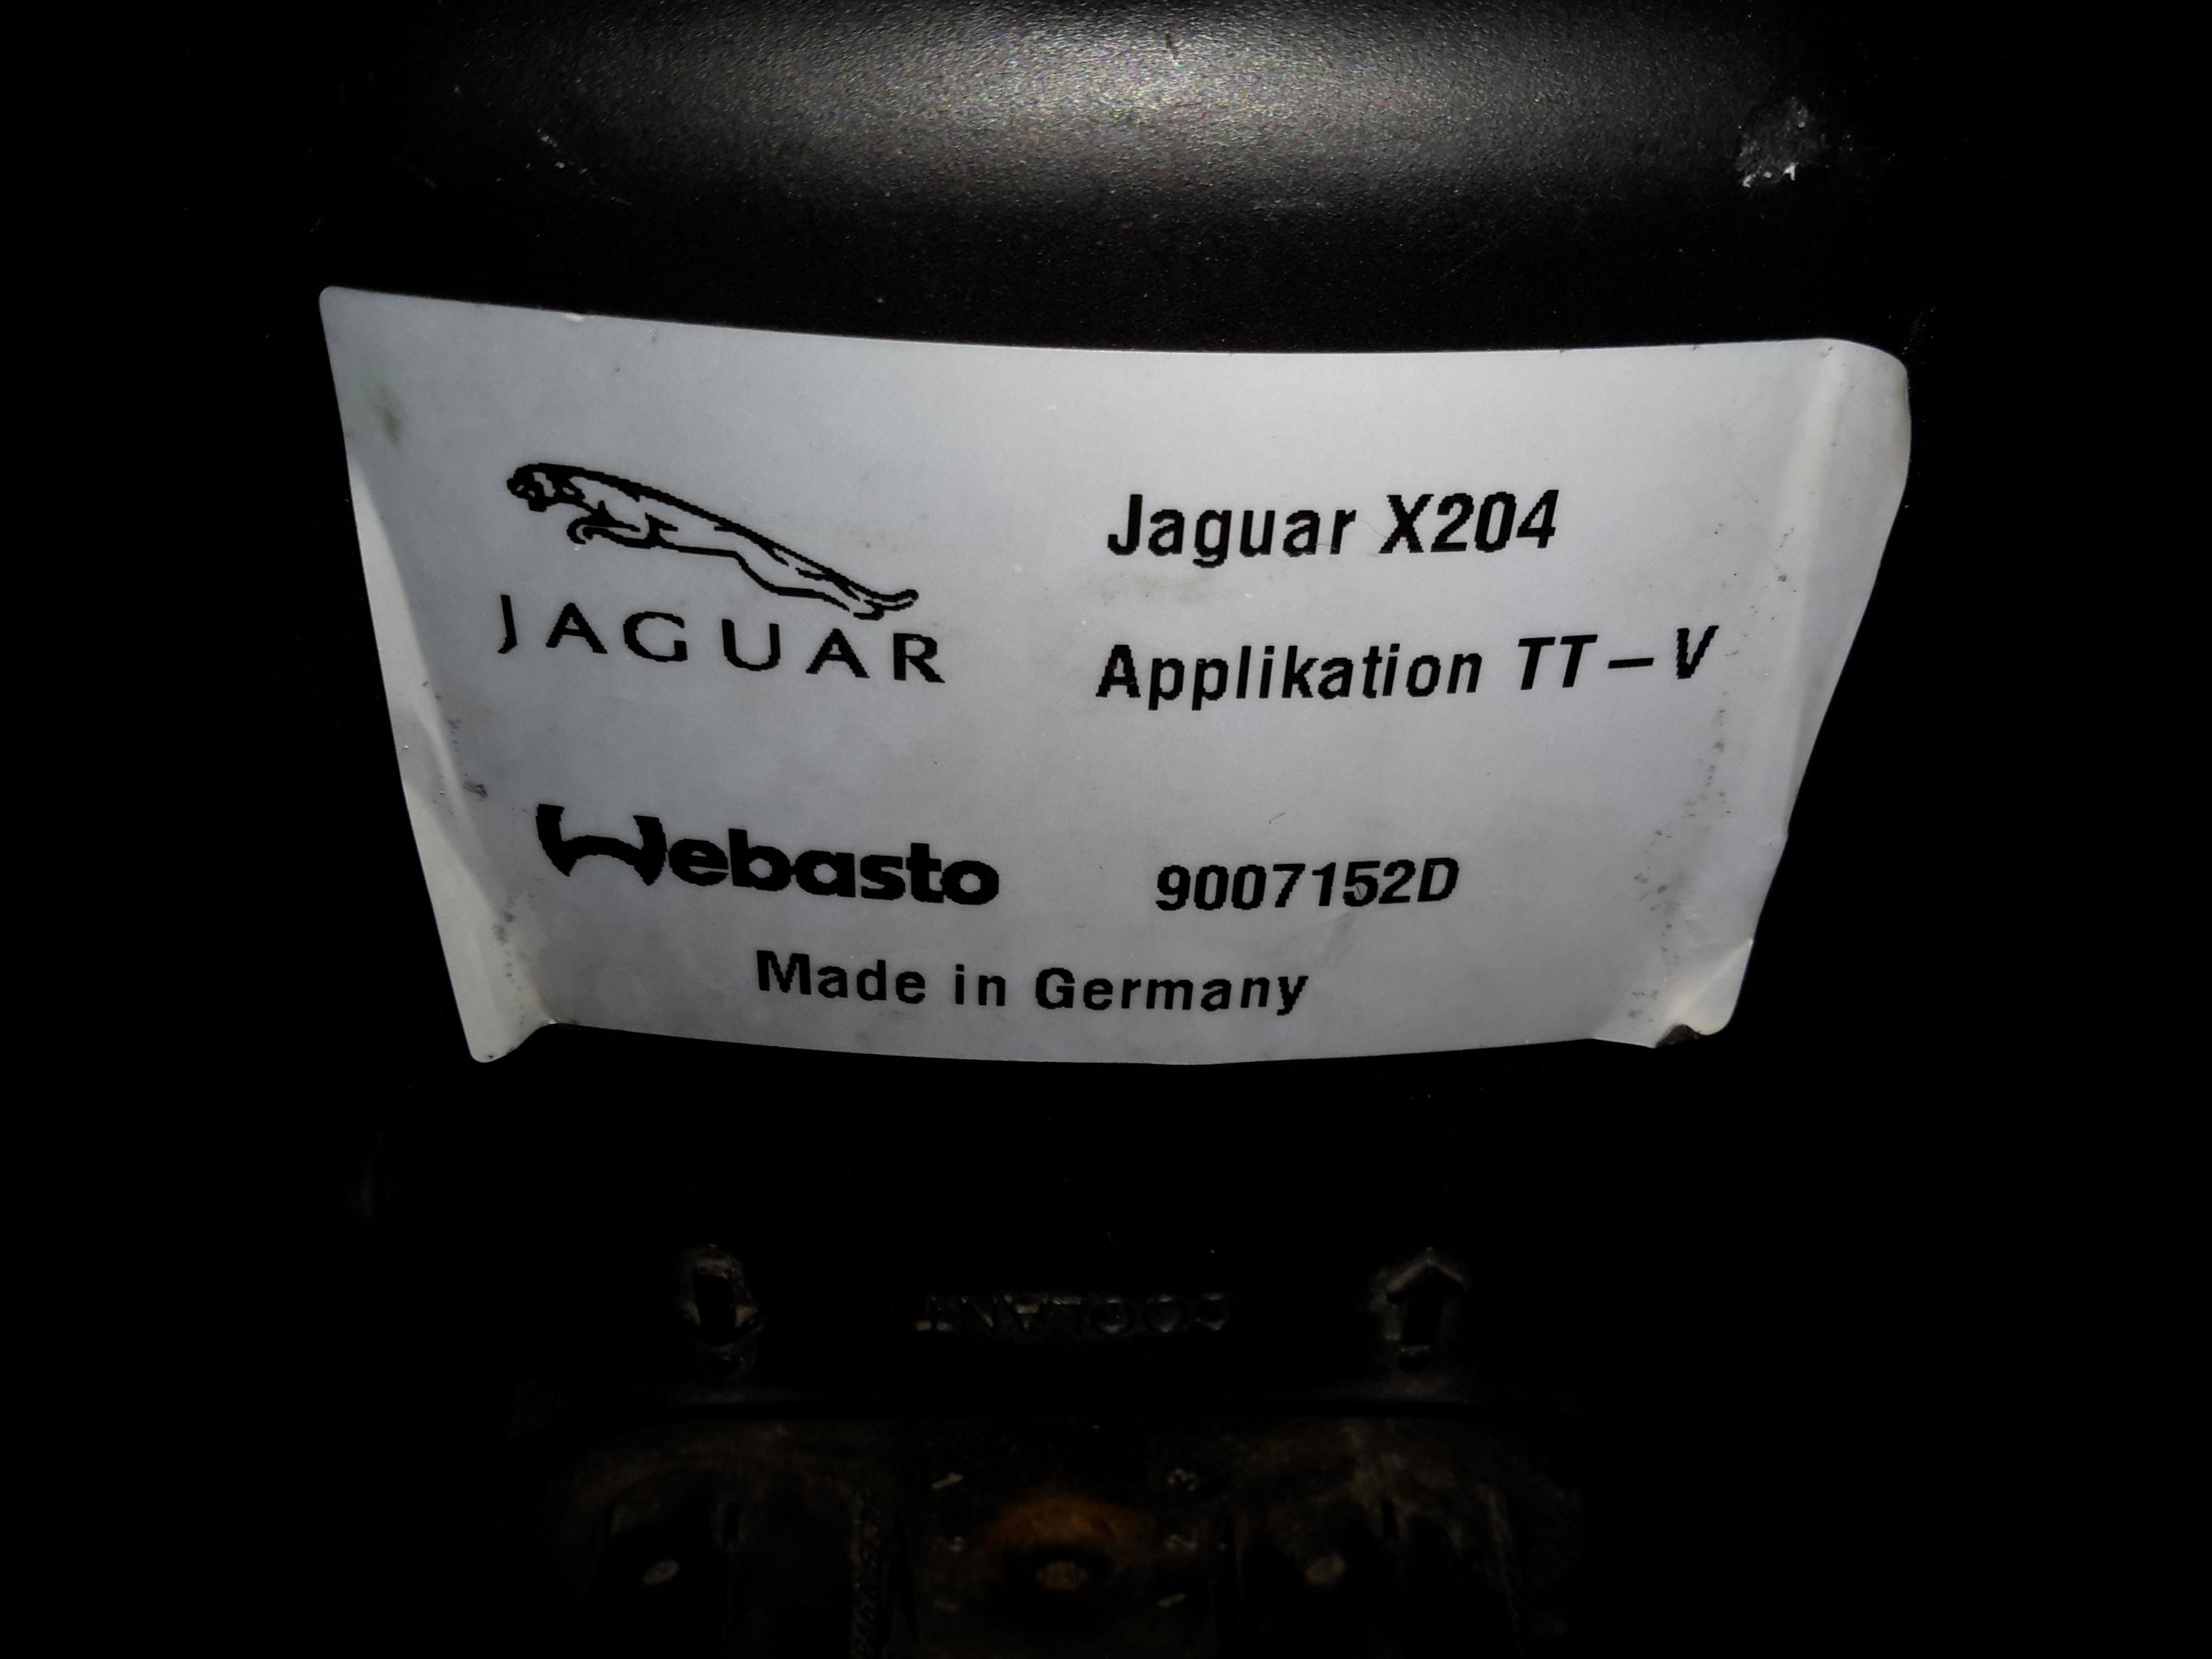 Jaguar S Type Aux Heater Webasto Thermo Top V Part 1 Teardown Current Clamp Glow Plug Circuit Jag Label